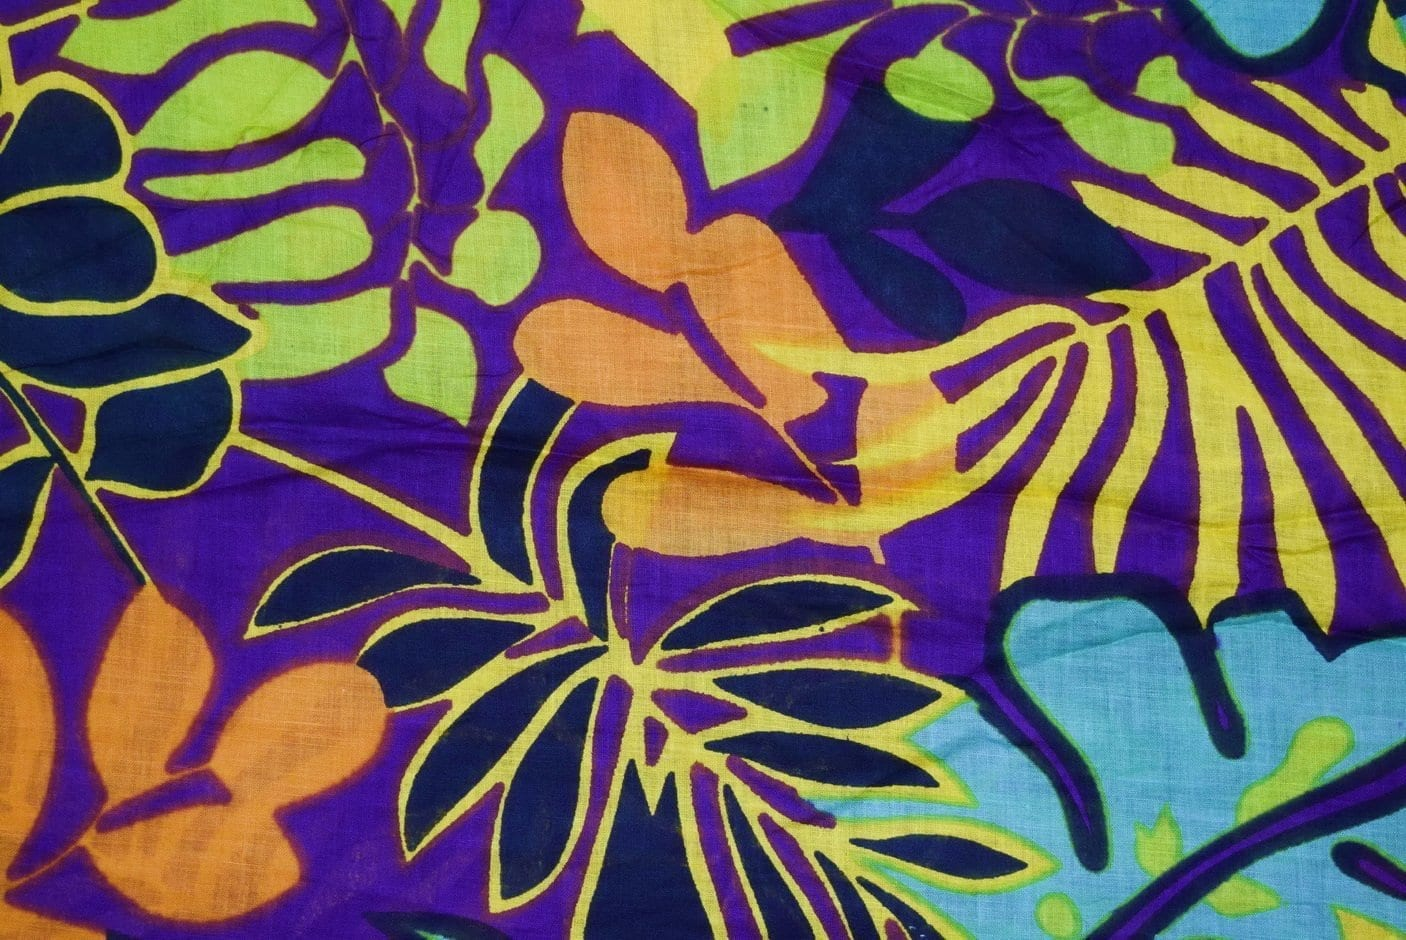 100% PURE Soft COTTON PRINTED fabric PC265 2